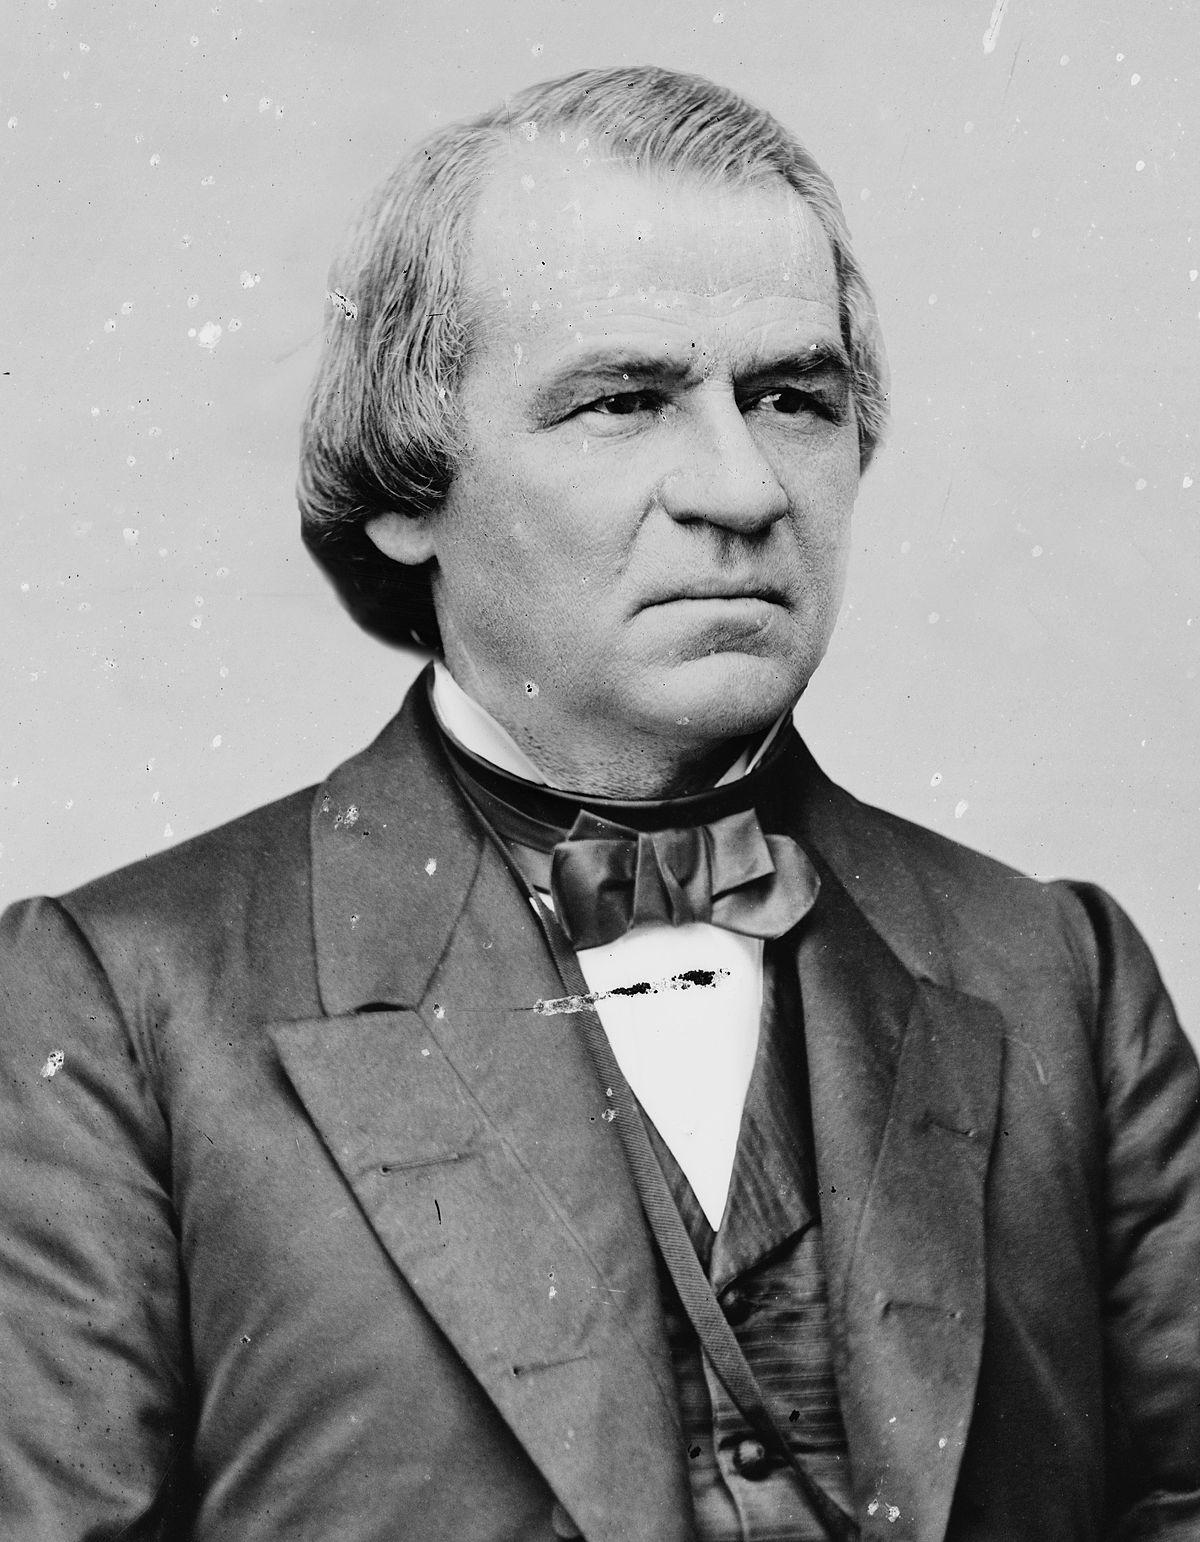 Andrew Johnson photo portrait head and shoulders, c1870-1880.jpg